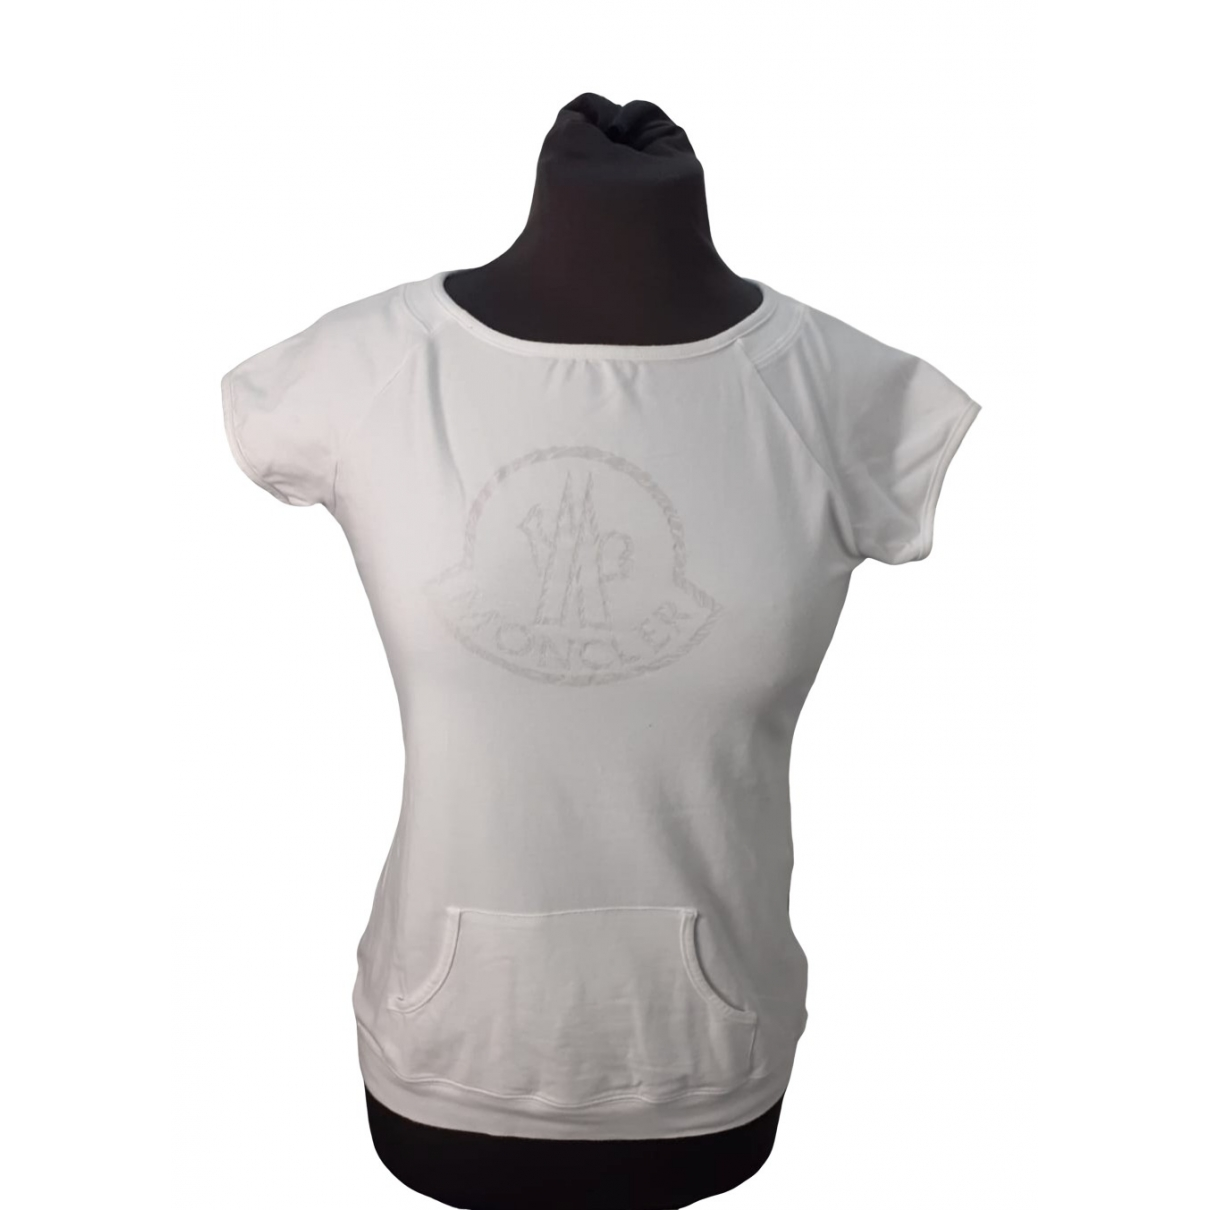 Moncler \N White Cotton  top for Women XS International